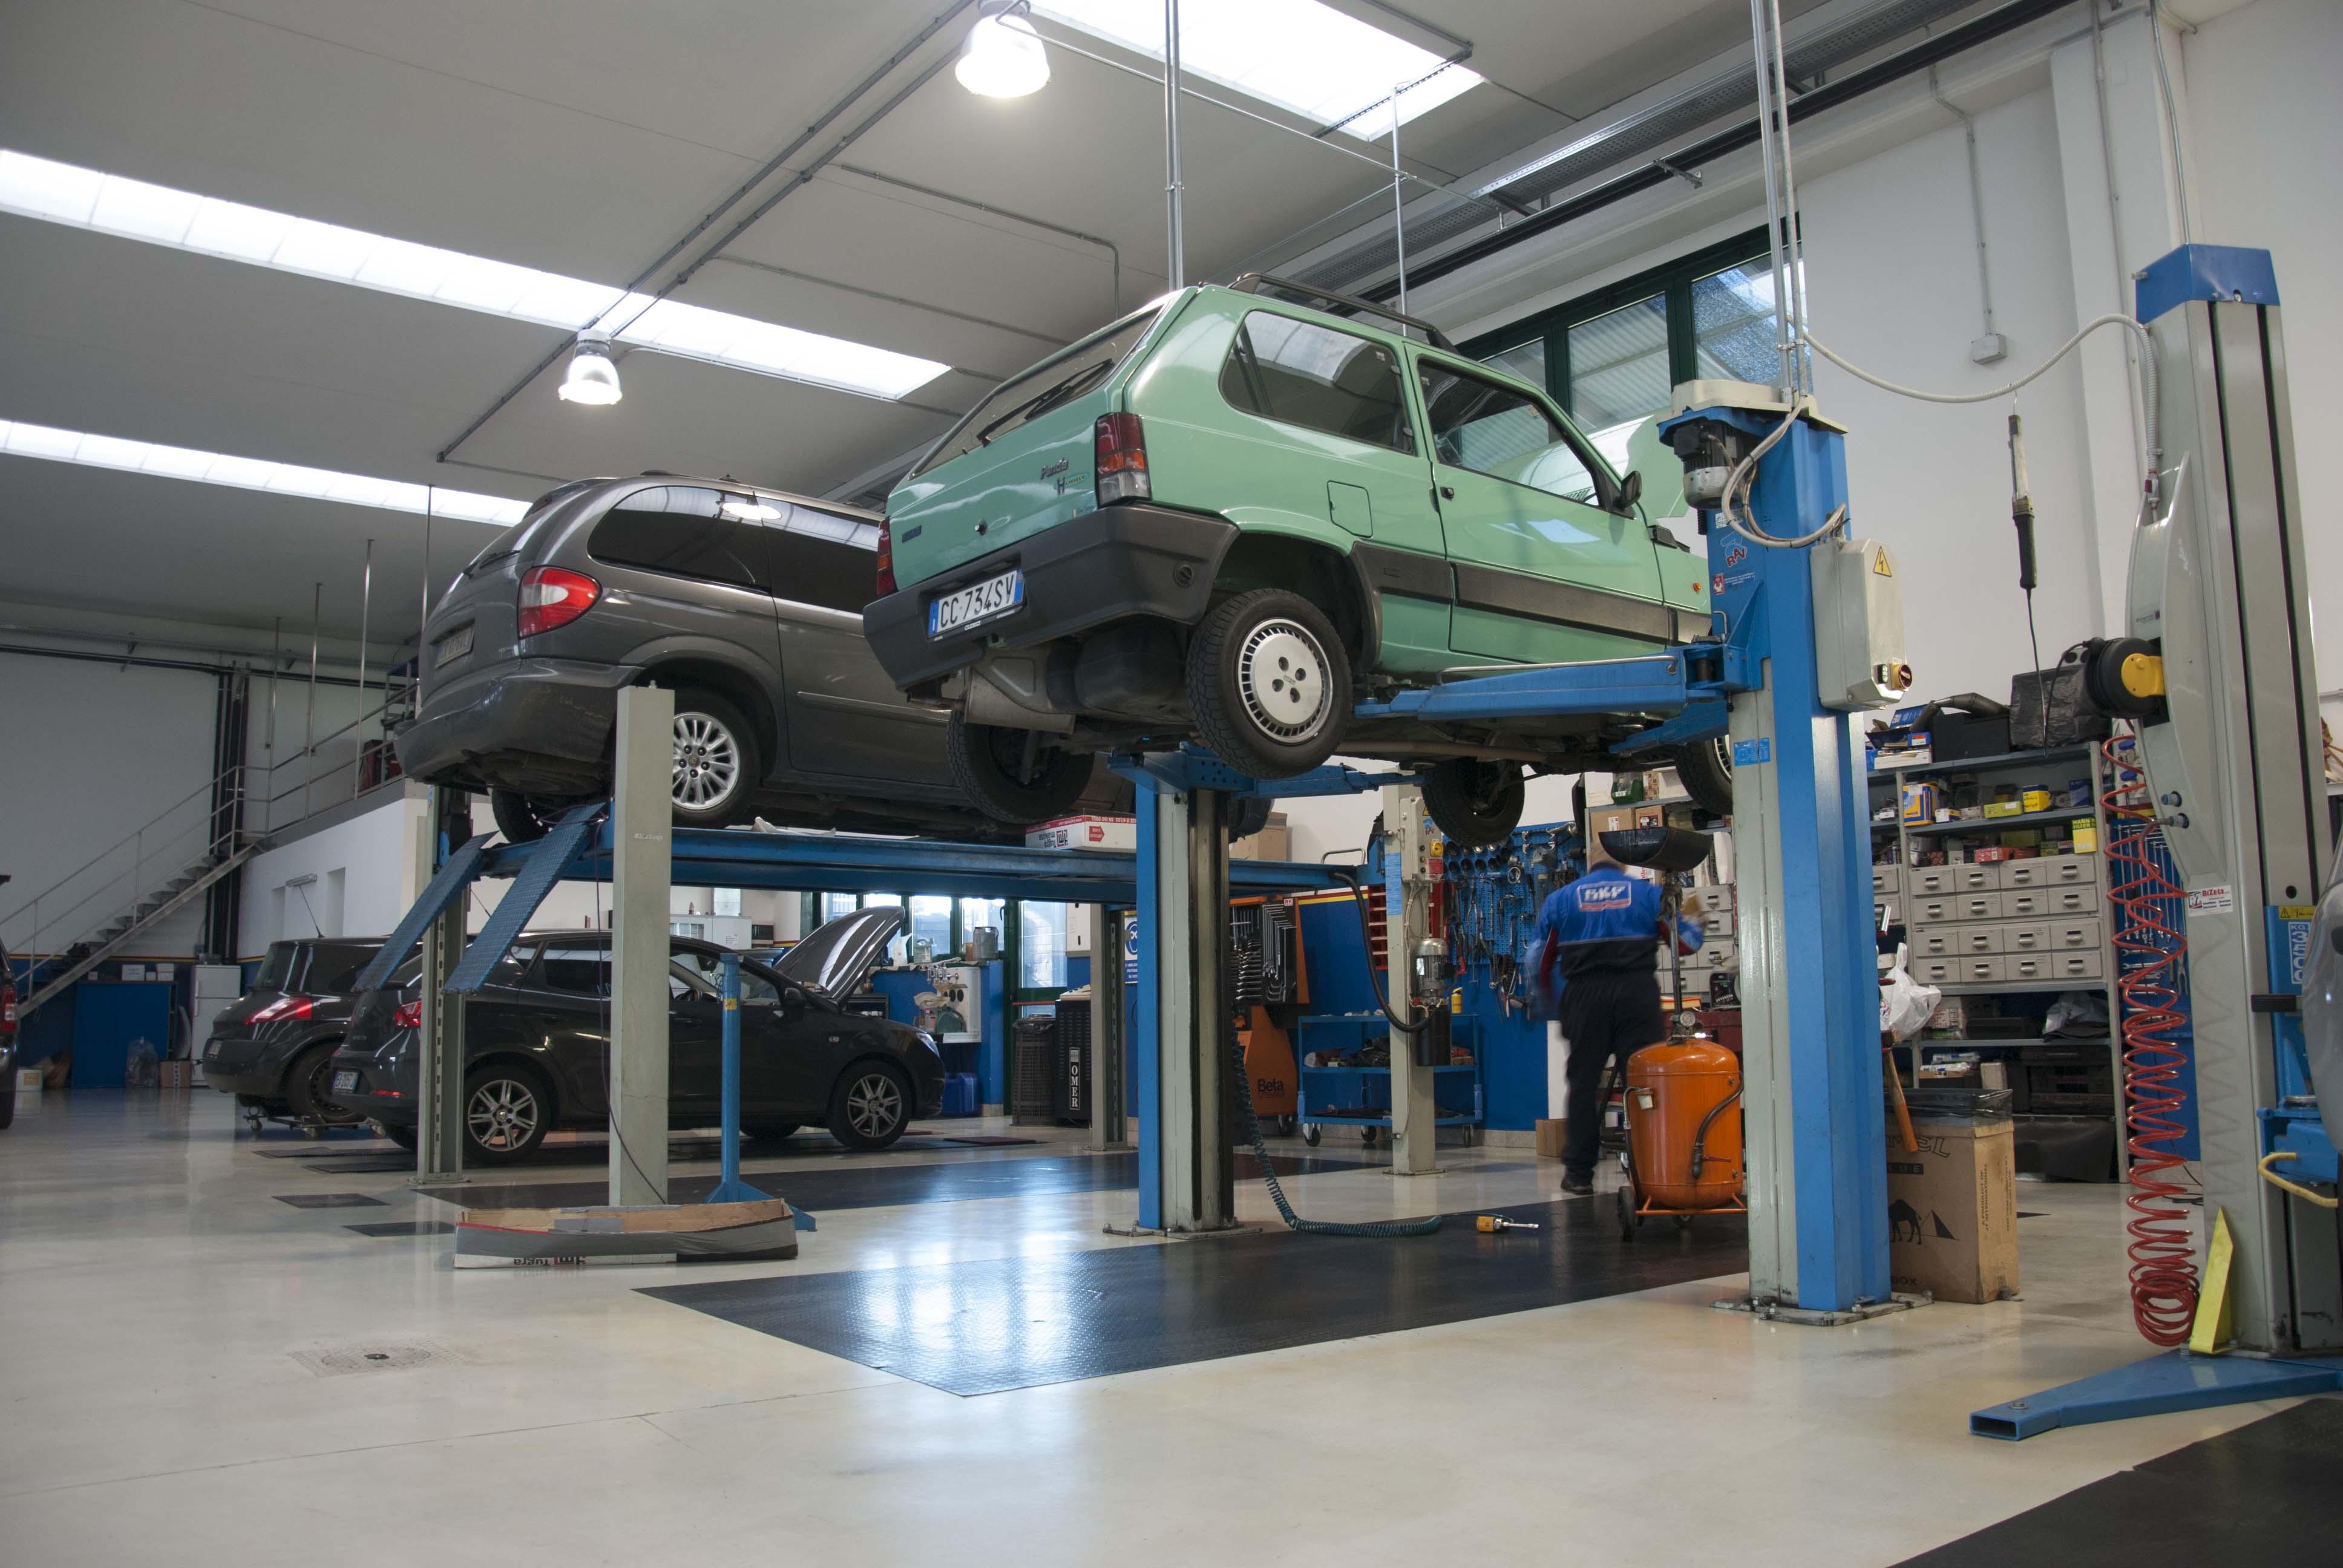 john garage officina meccanica impianti gpl centro